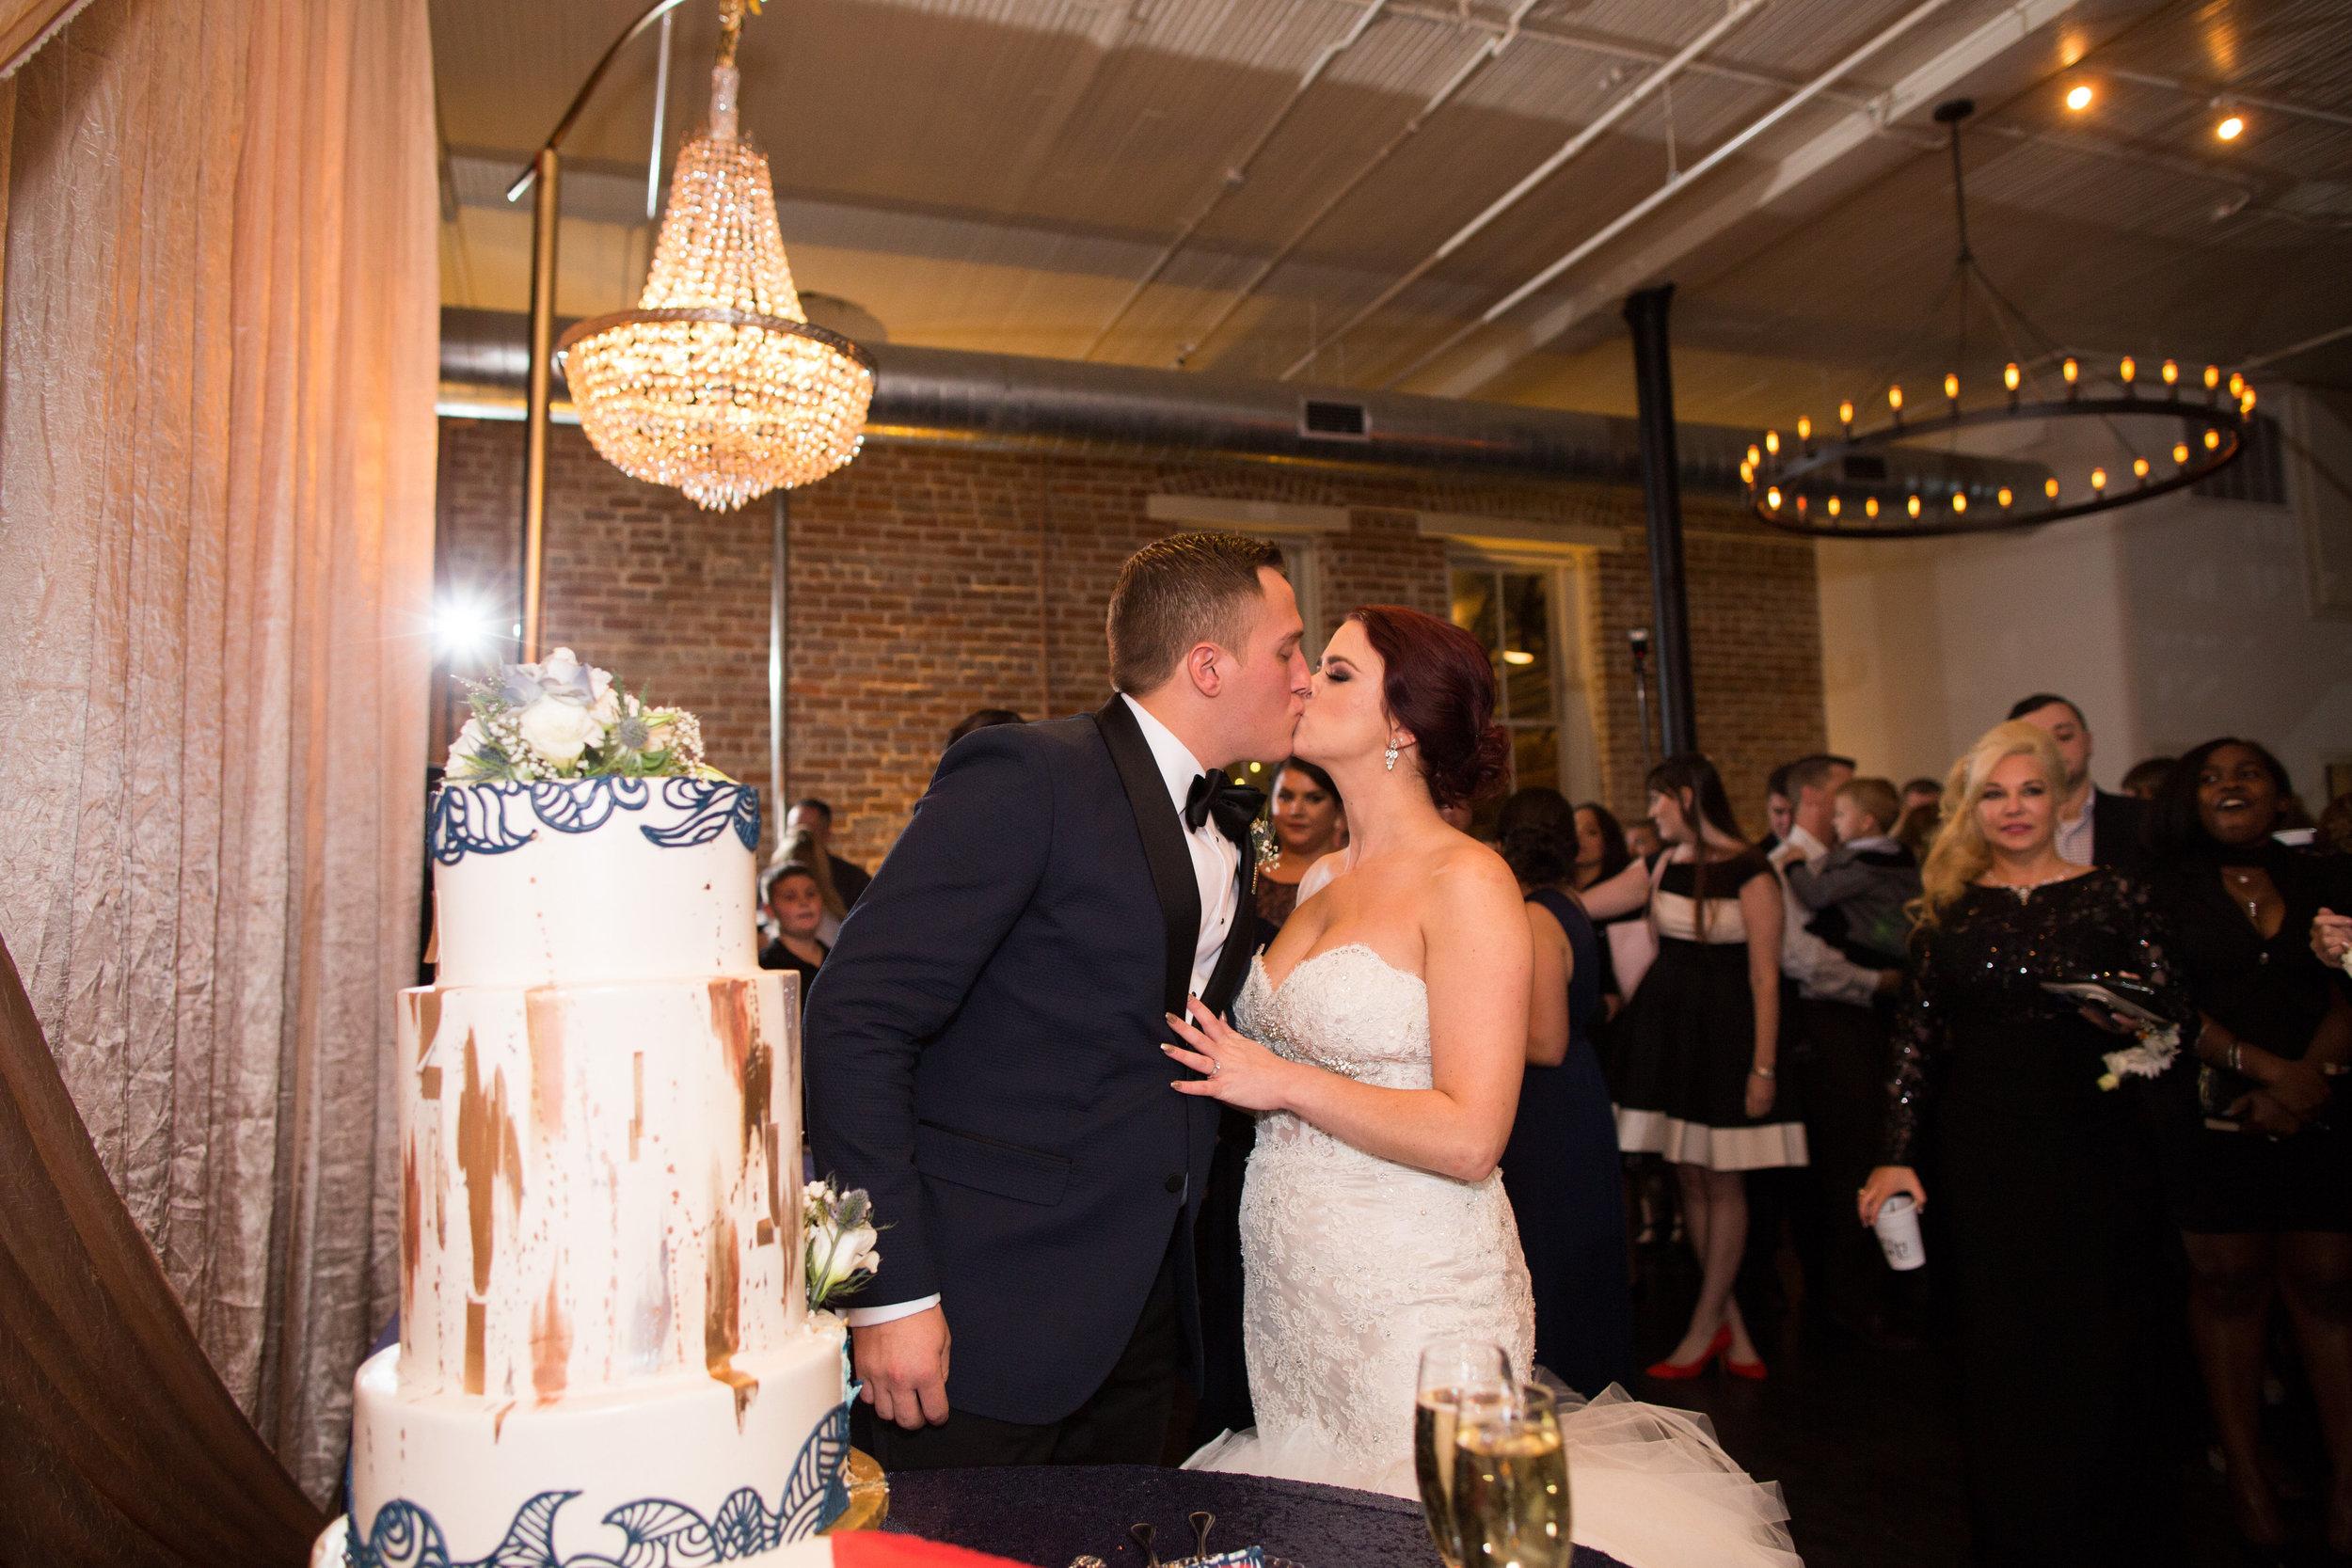 Danielle Cameron s Wedding-7 Reception-0012.jpg